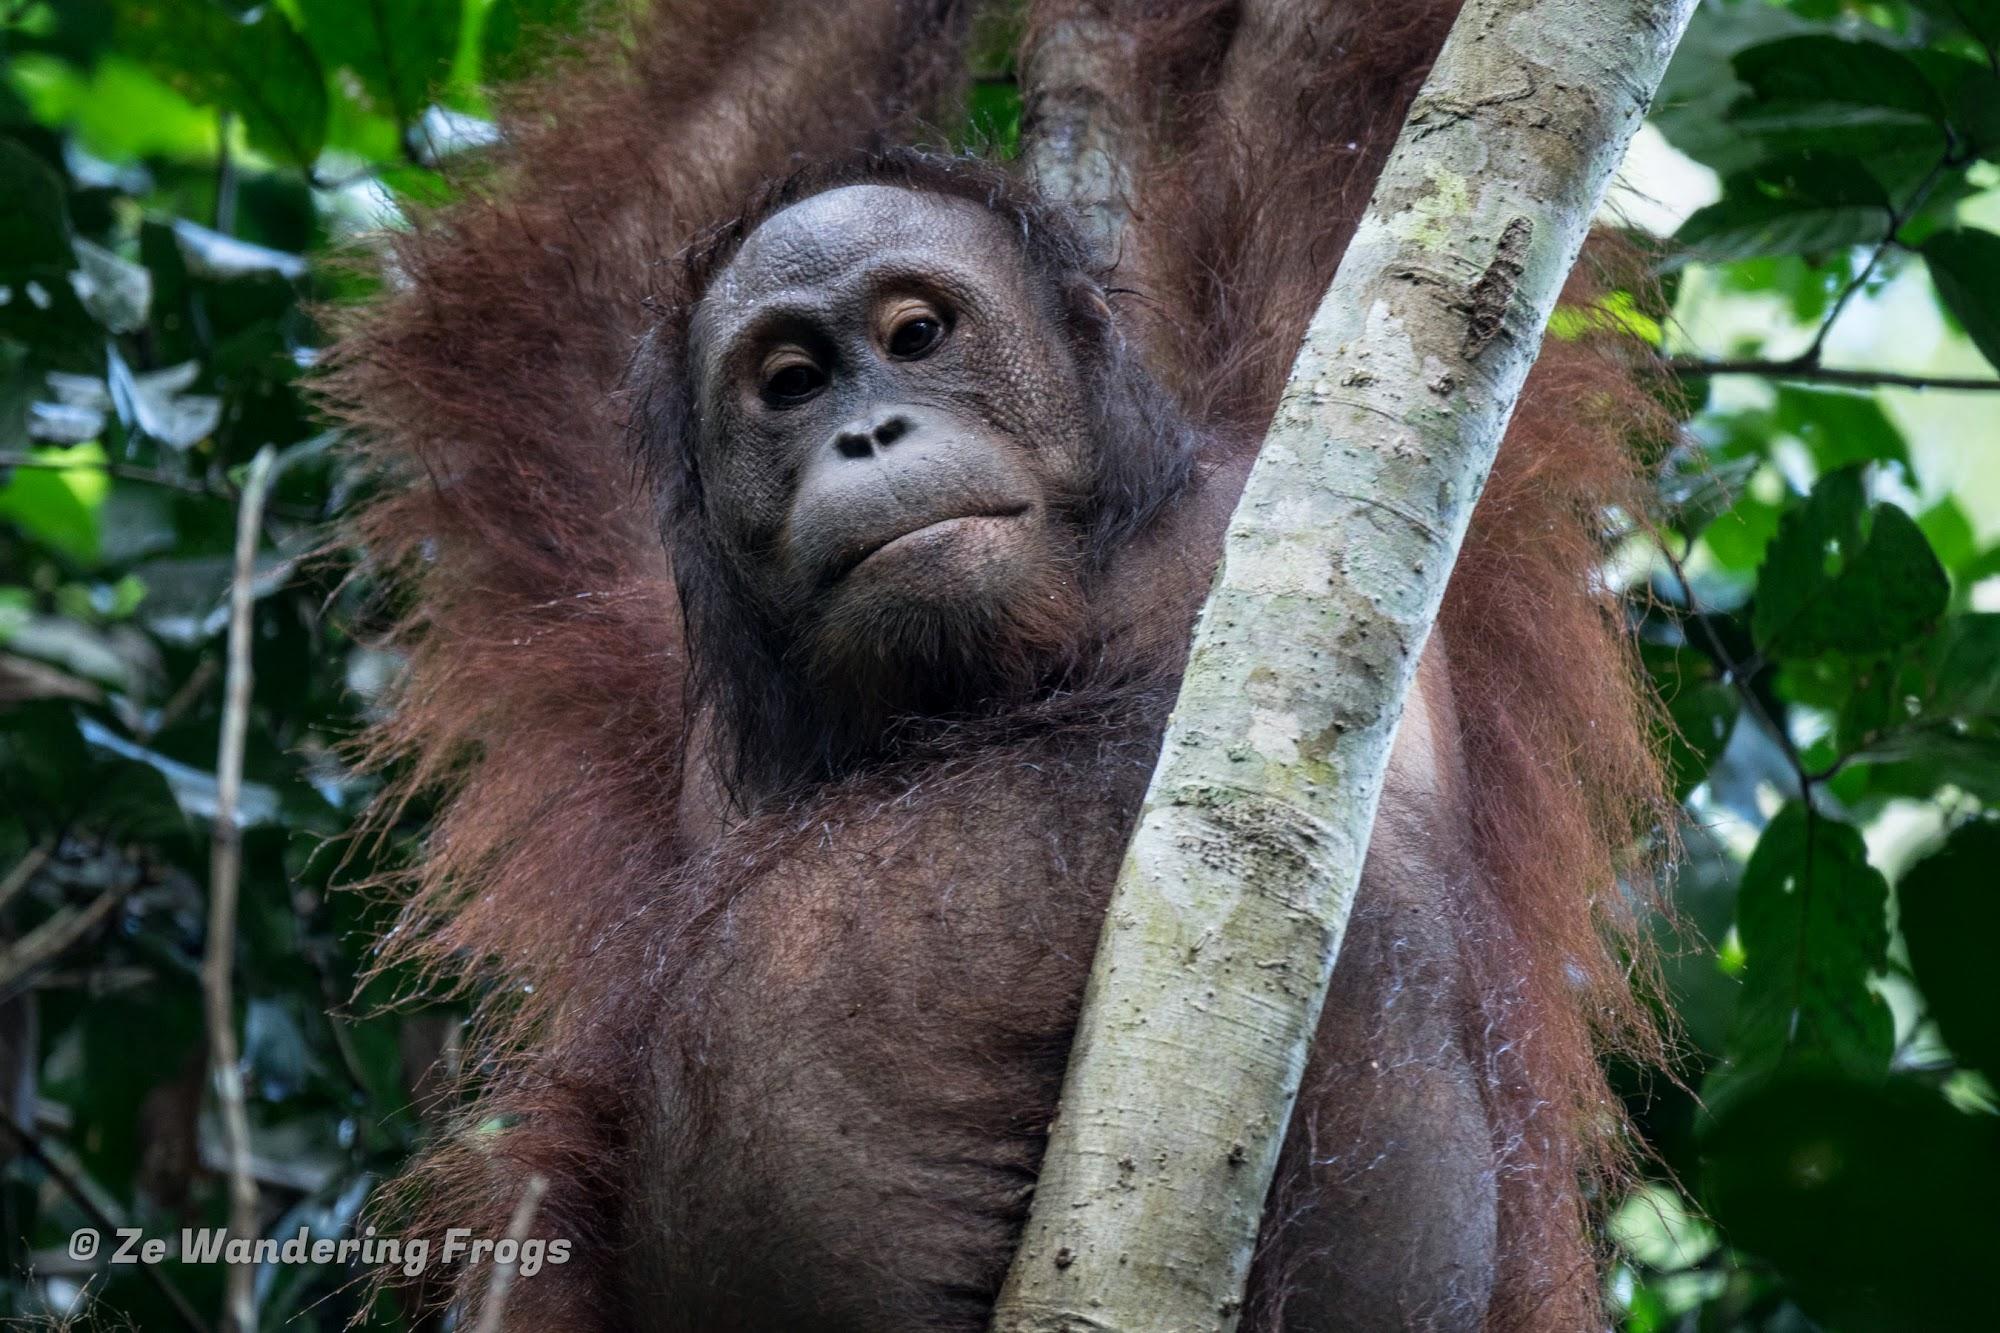 Searching For Wild Orangutans In The Borneo Jungle Of